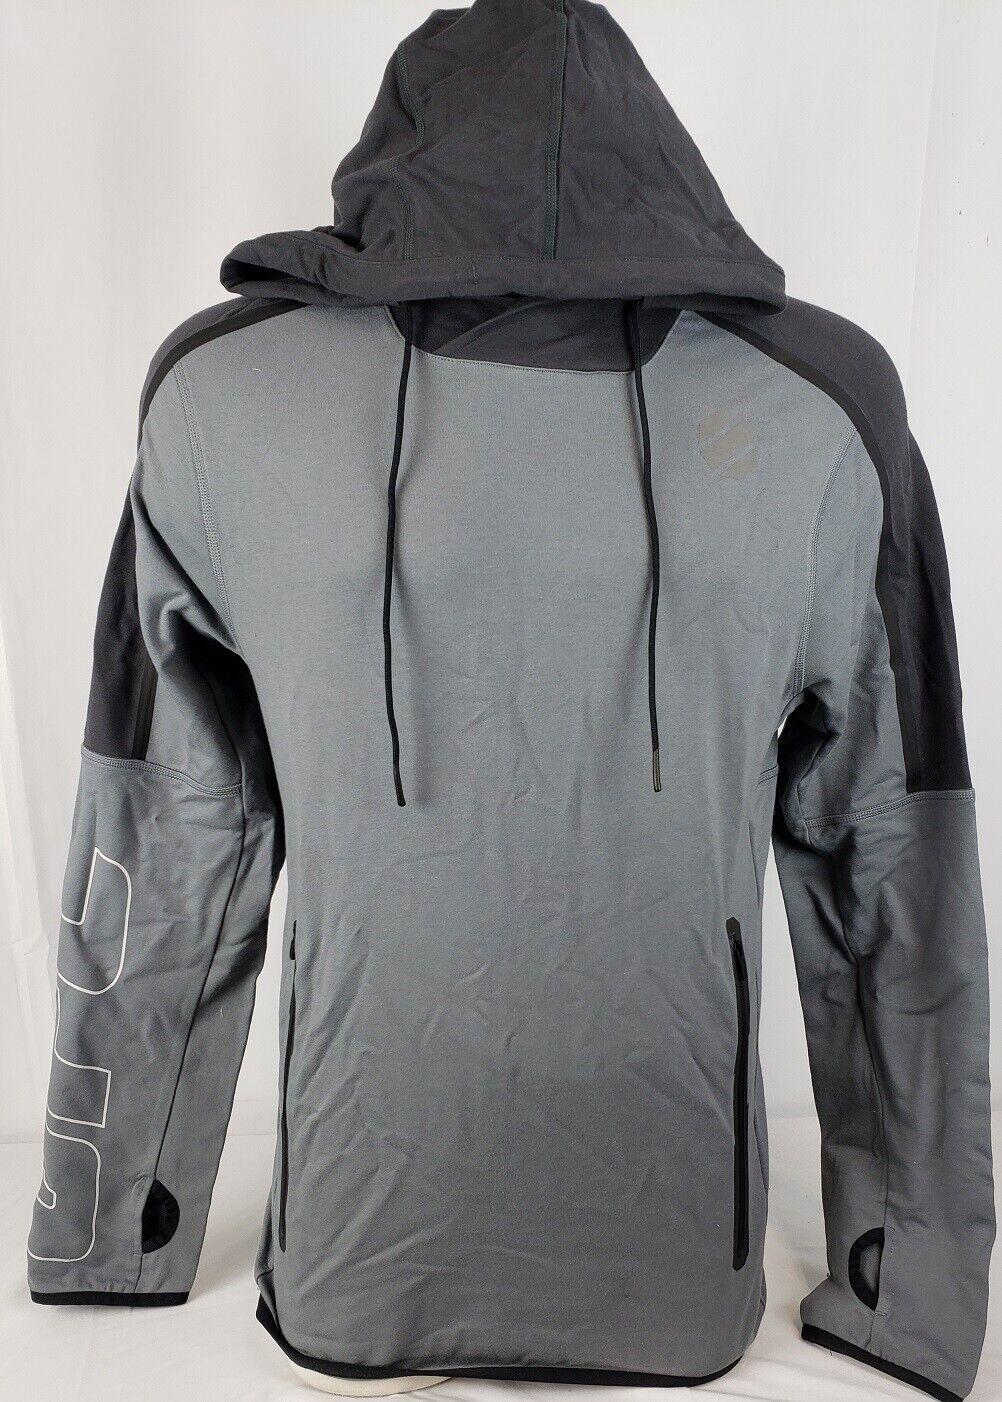 BRAND NEW Reebok UFC Combat Slim Hooded Sweatshirt